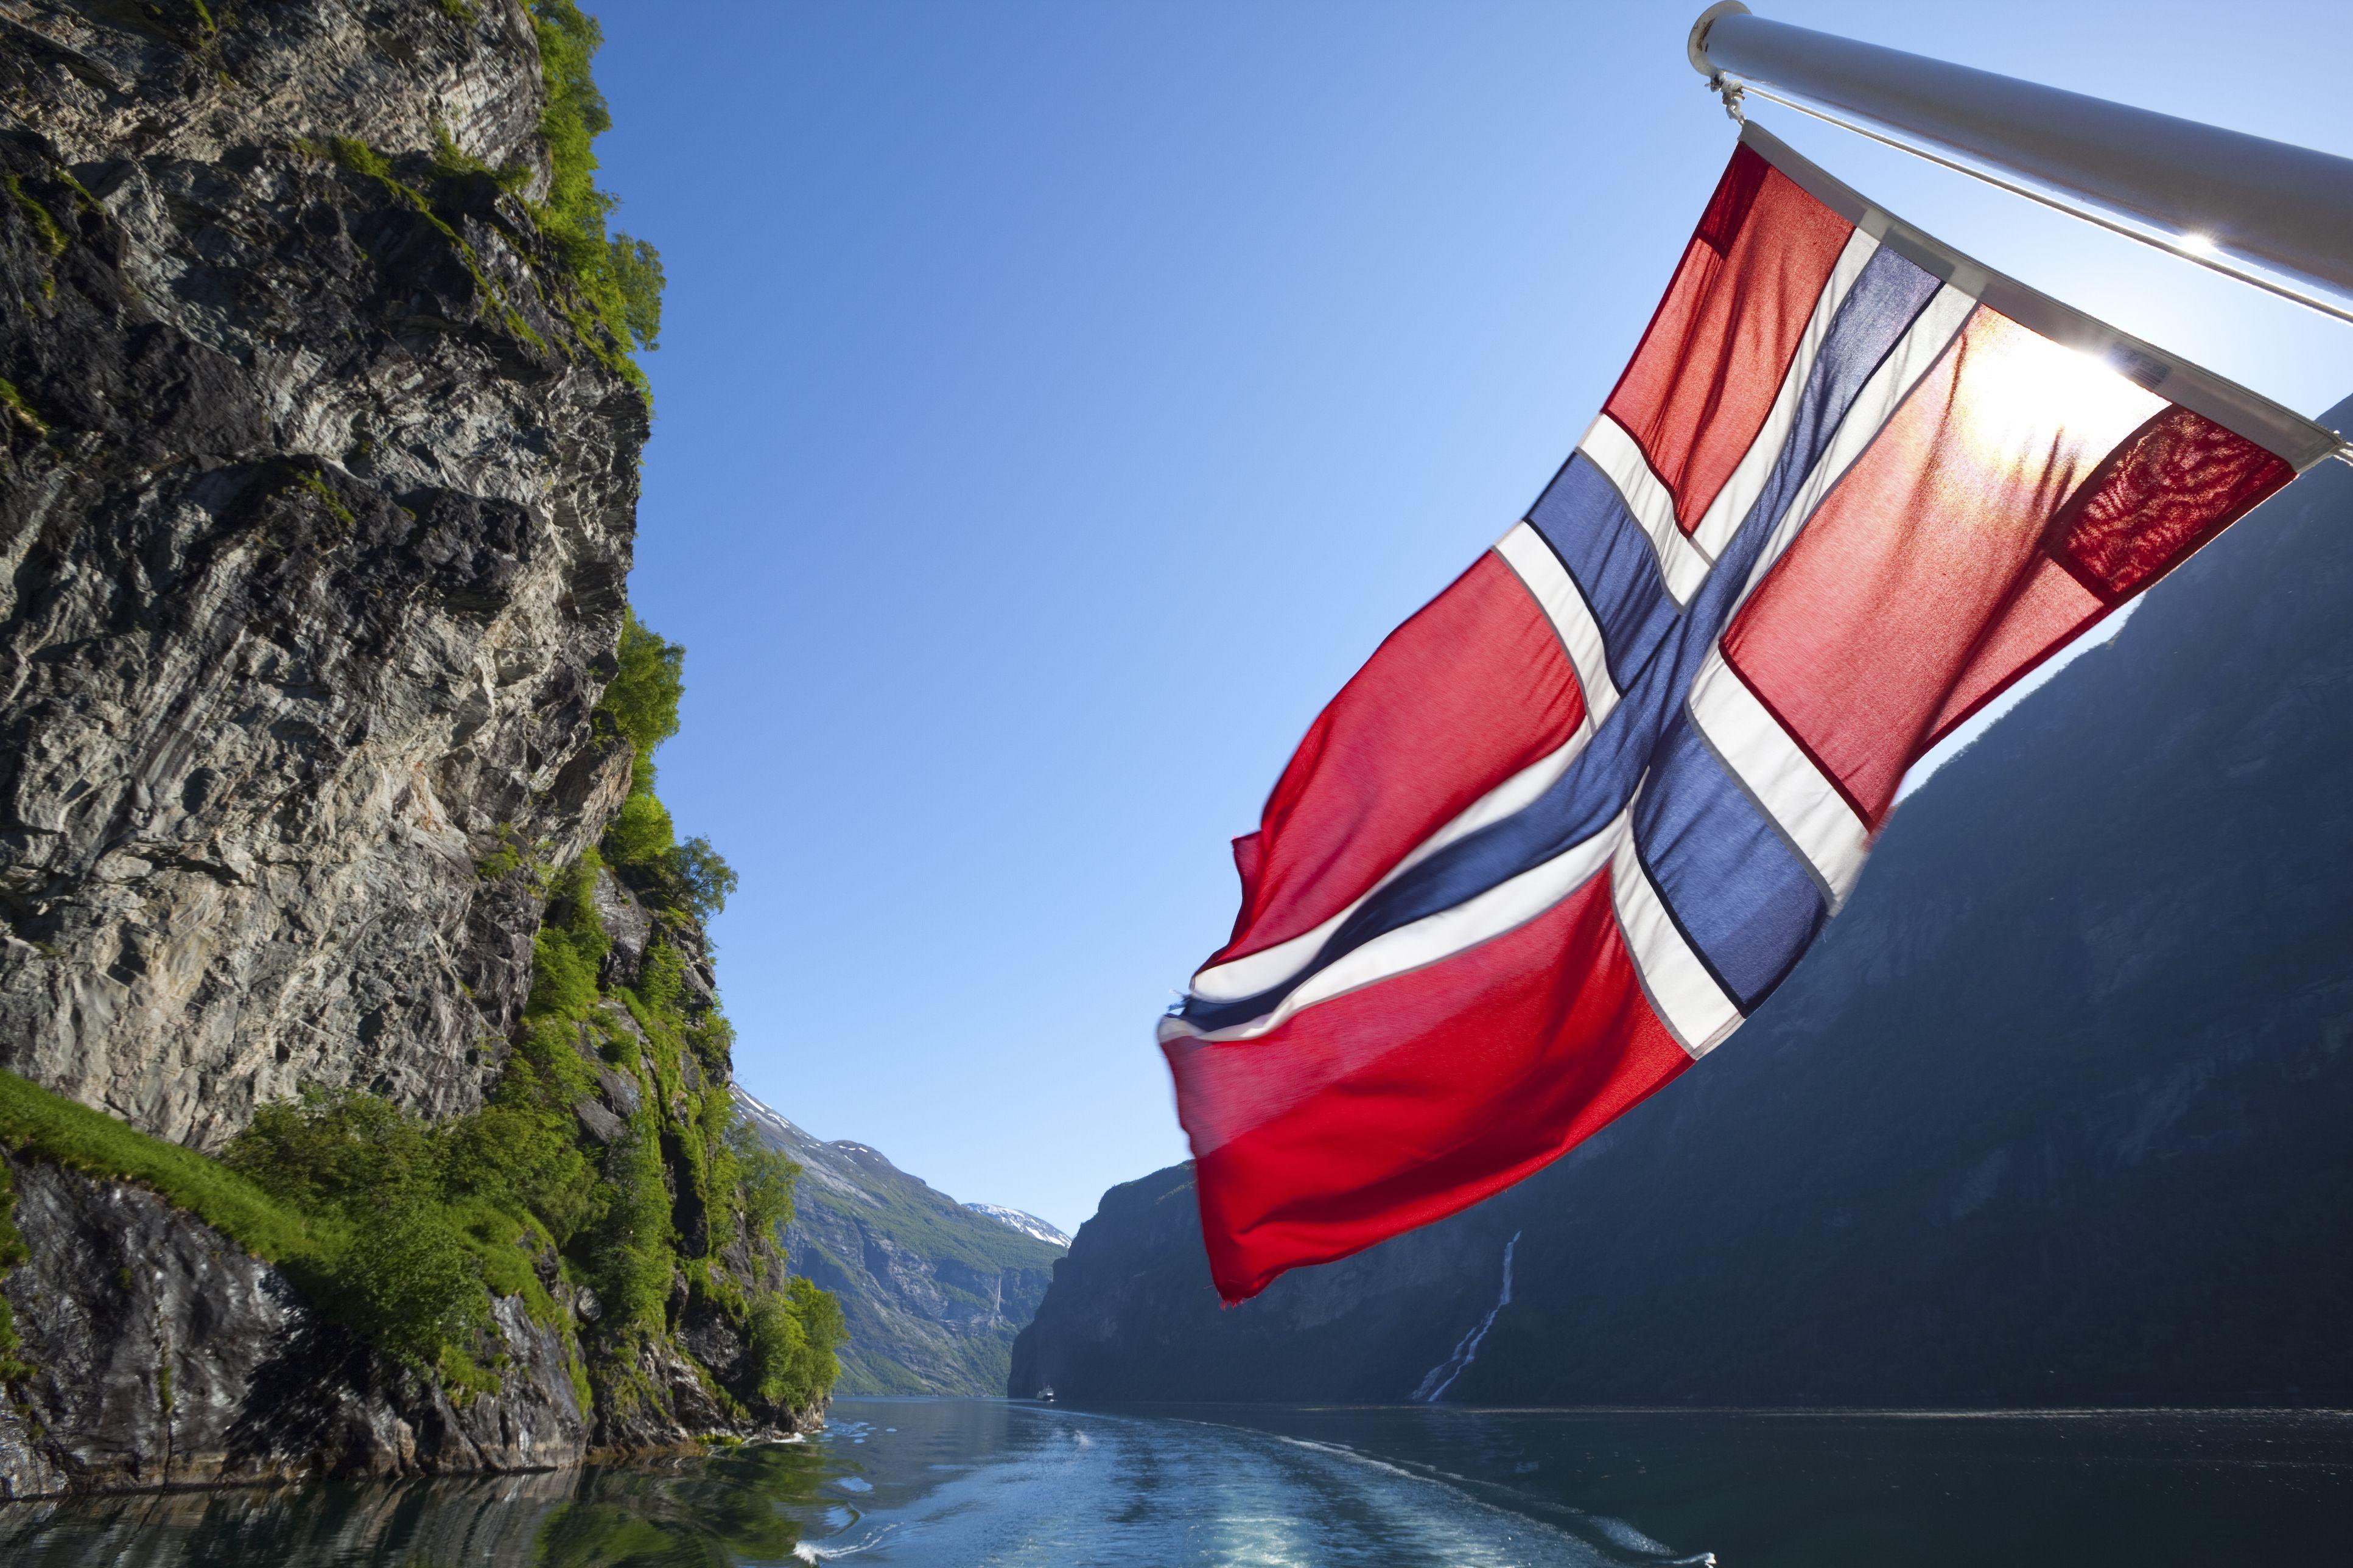 Norwegian flag on ferry in Geiranger Fjord, Norway